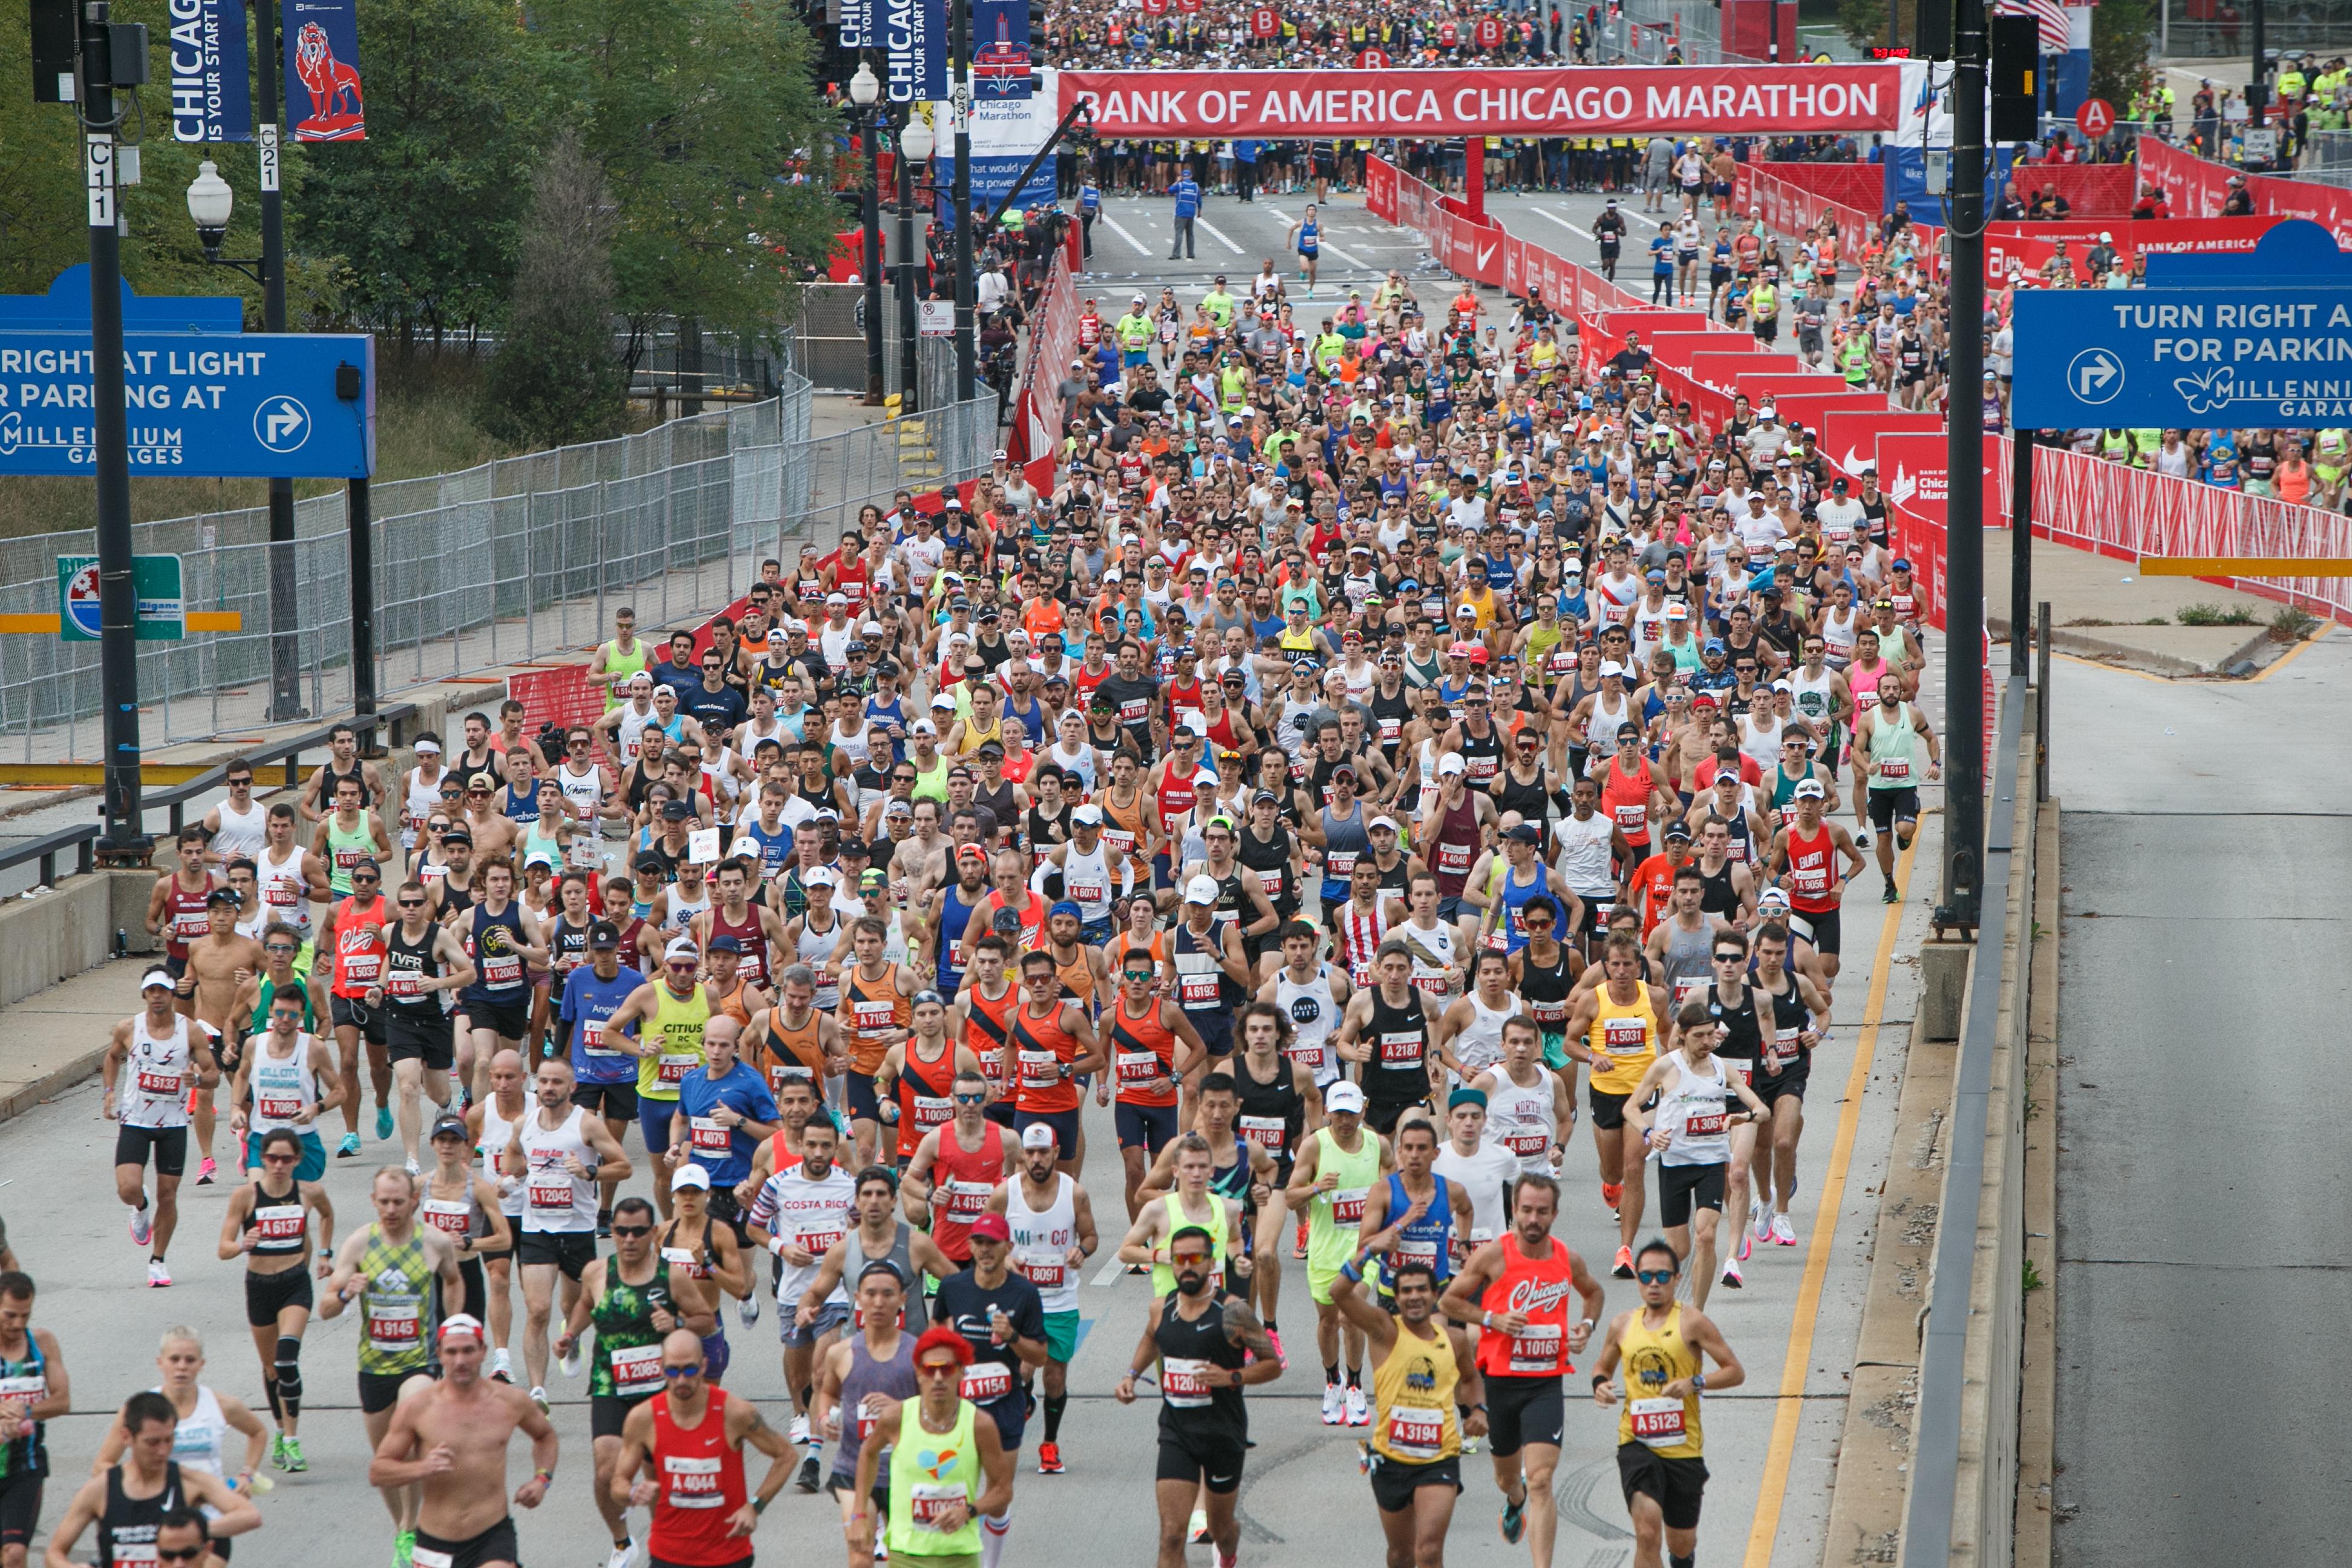 Runners start at the Chicago Marathon on Columbus Drive Sunday morning, Oct. 10, 2021.